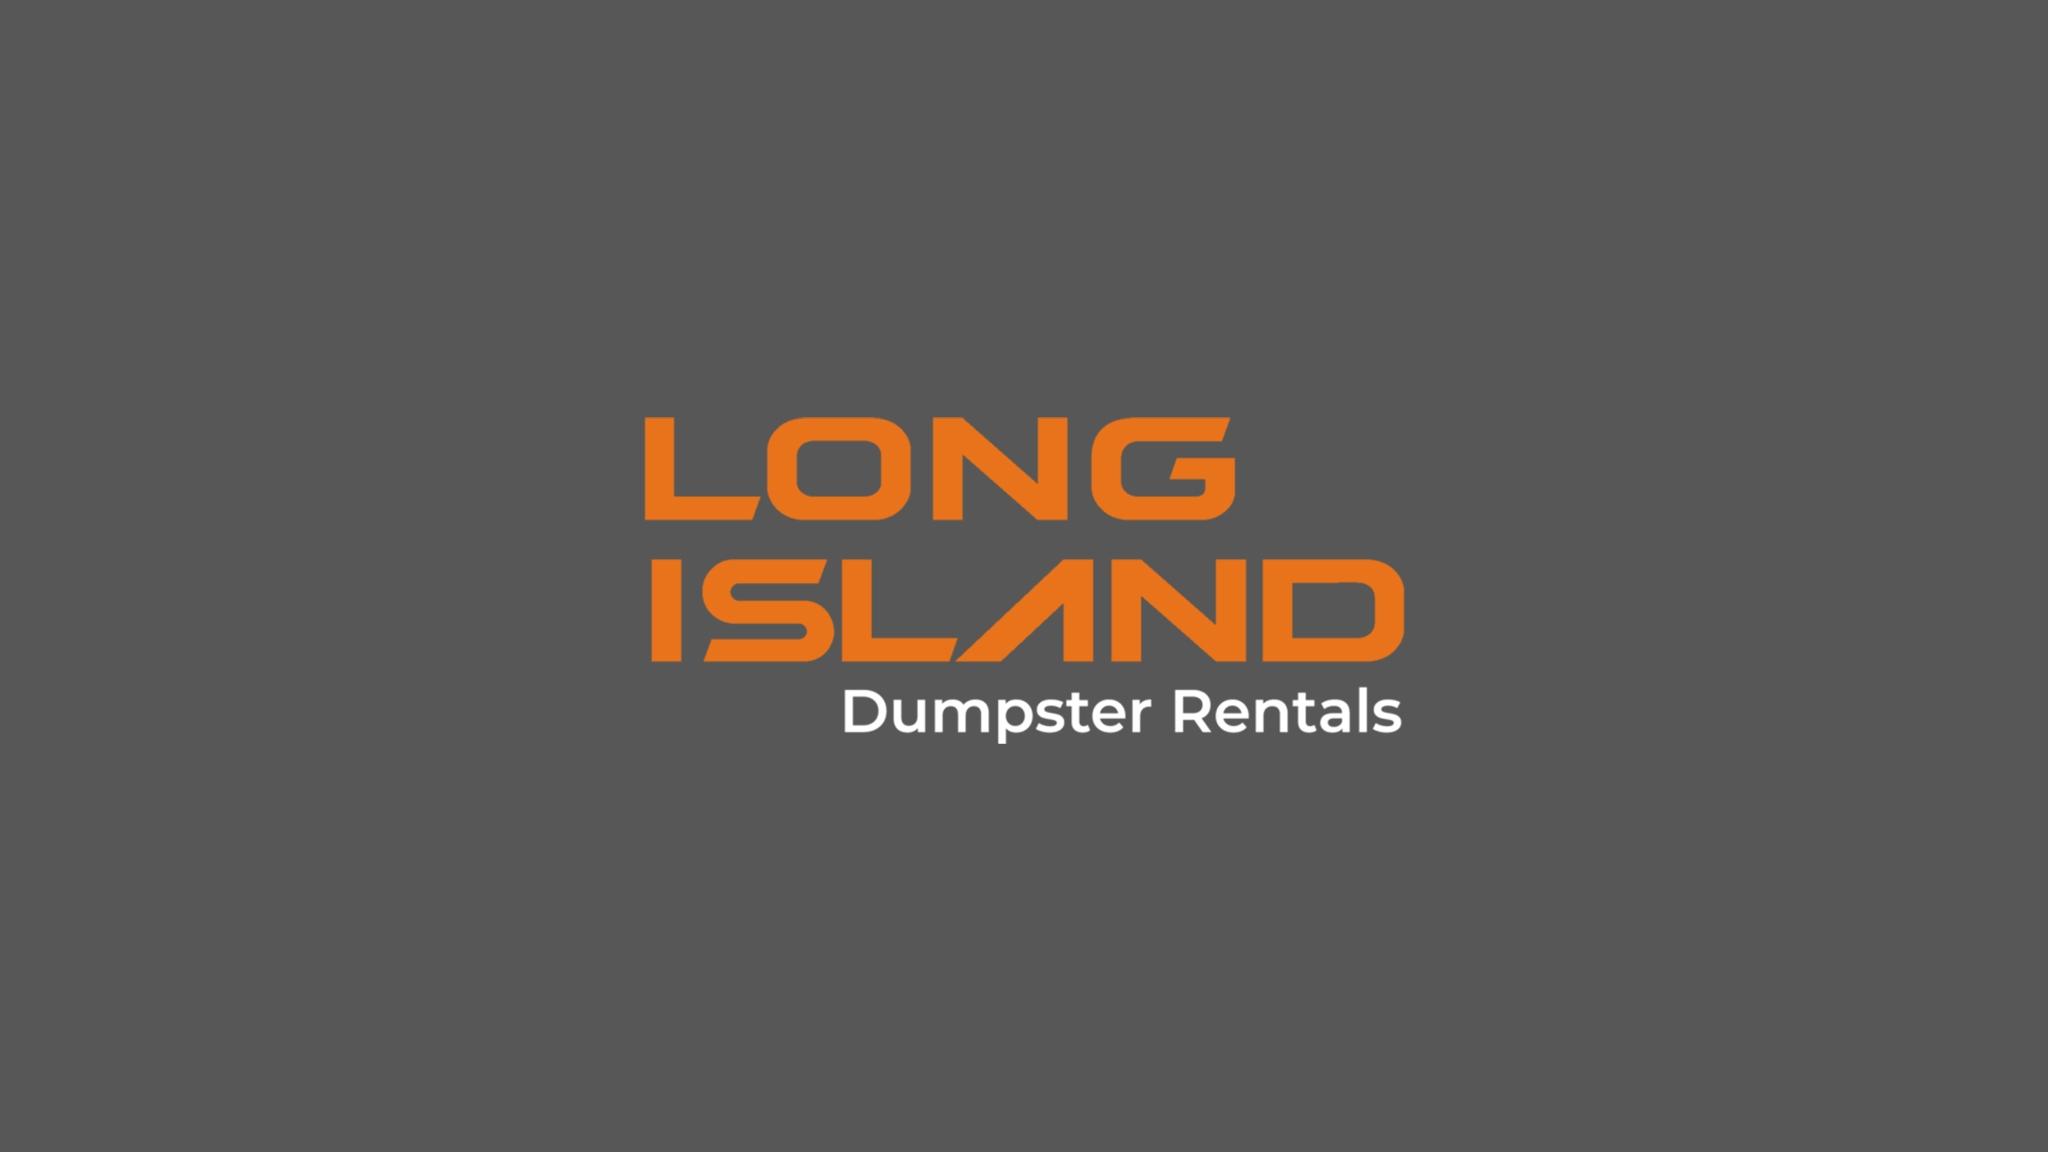 Long Island Dumpster Rentals (@longislanddumpsterrentals) Cover Image